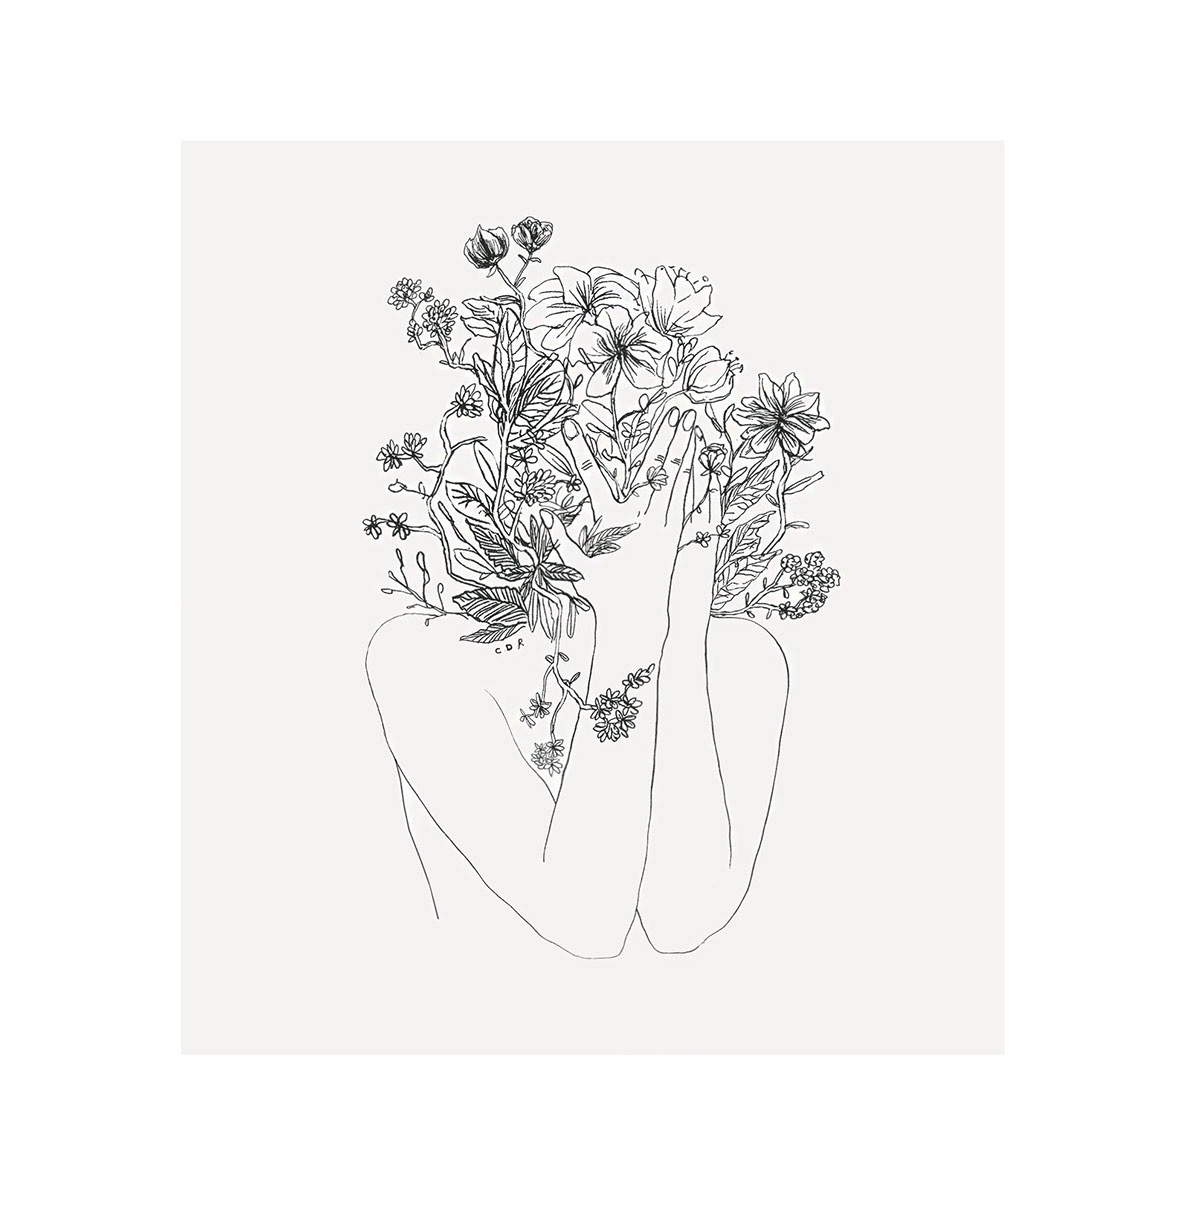 Claudia Deneault, illustration, dark, obscure, black and white, line illustration